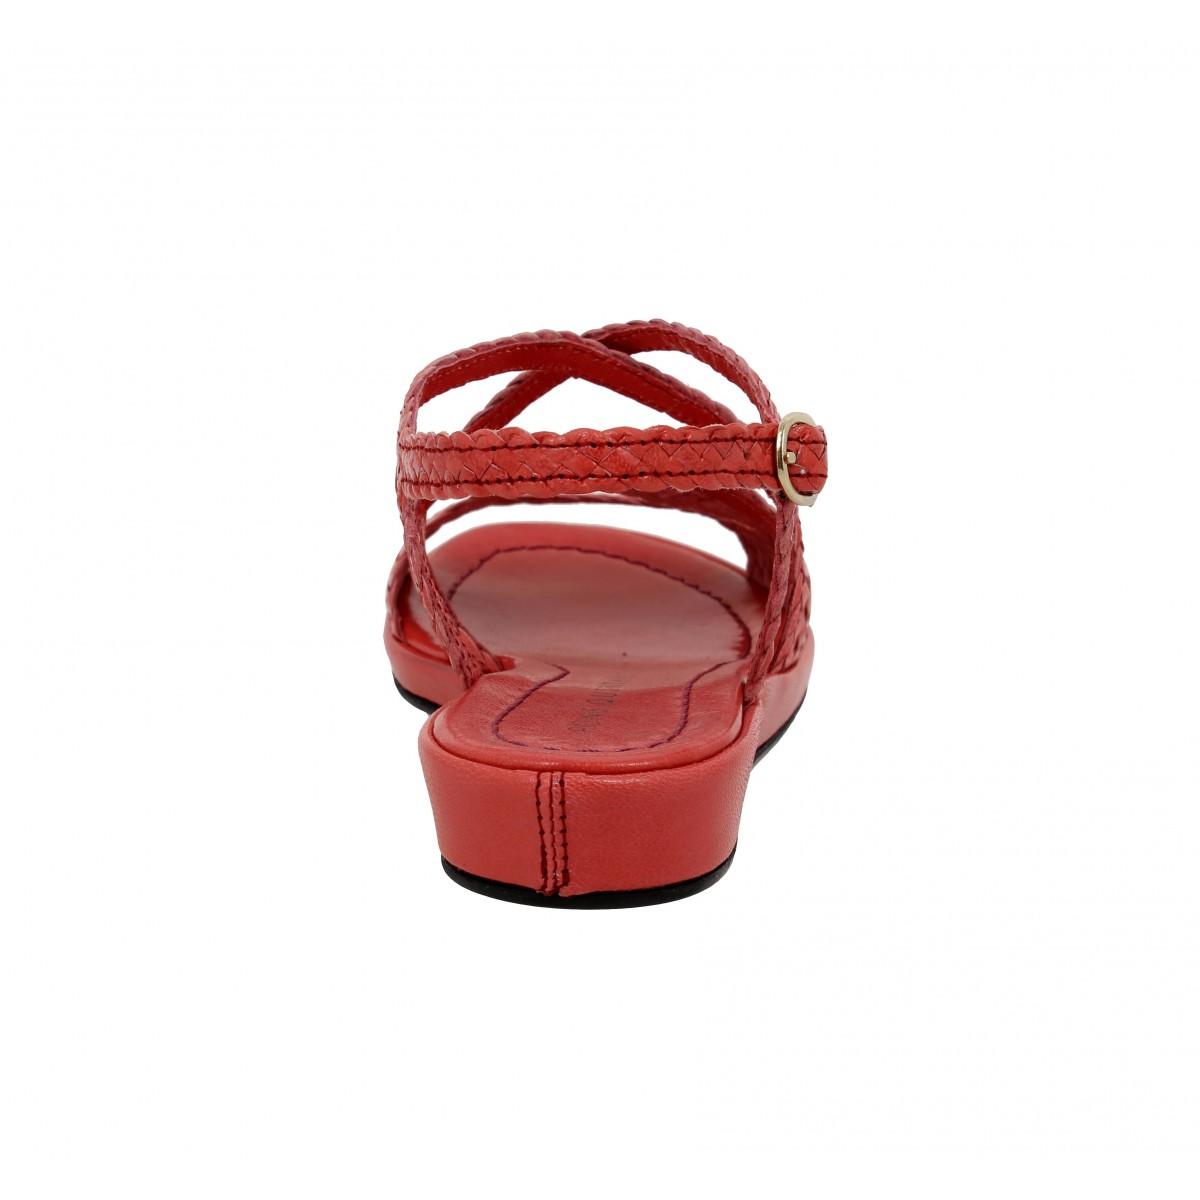 Tresse Cuir Femme Alma Quintana FraiseFanny Pons Chaussures UMVSzqp